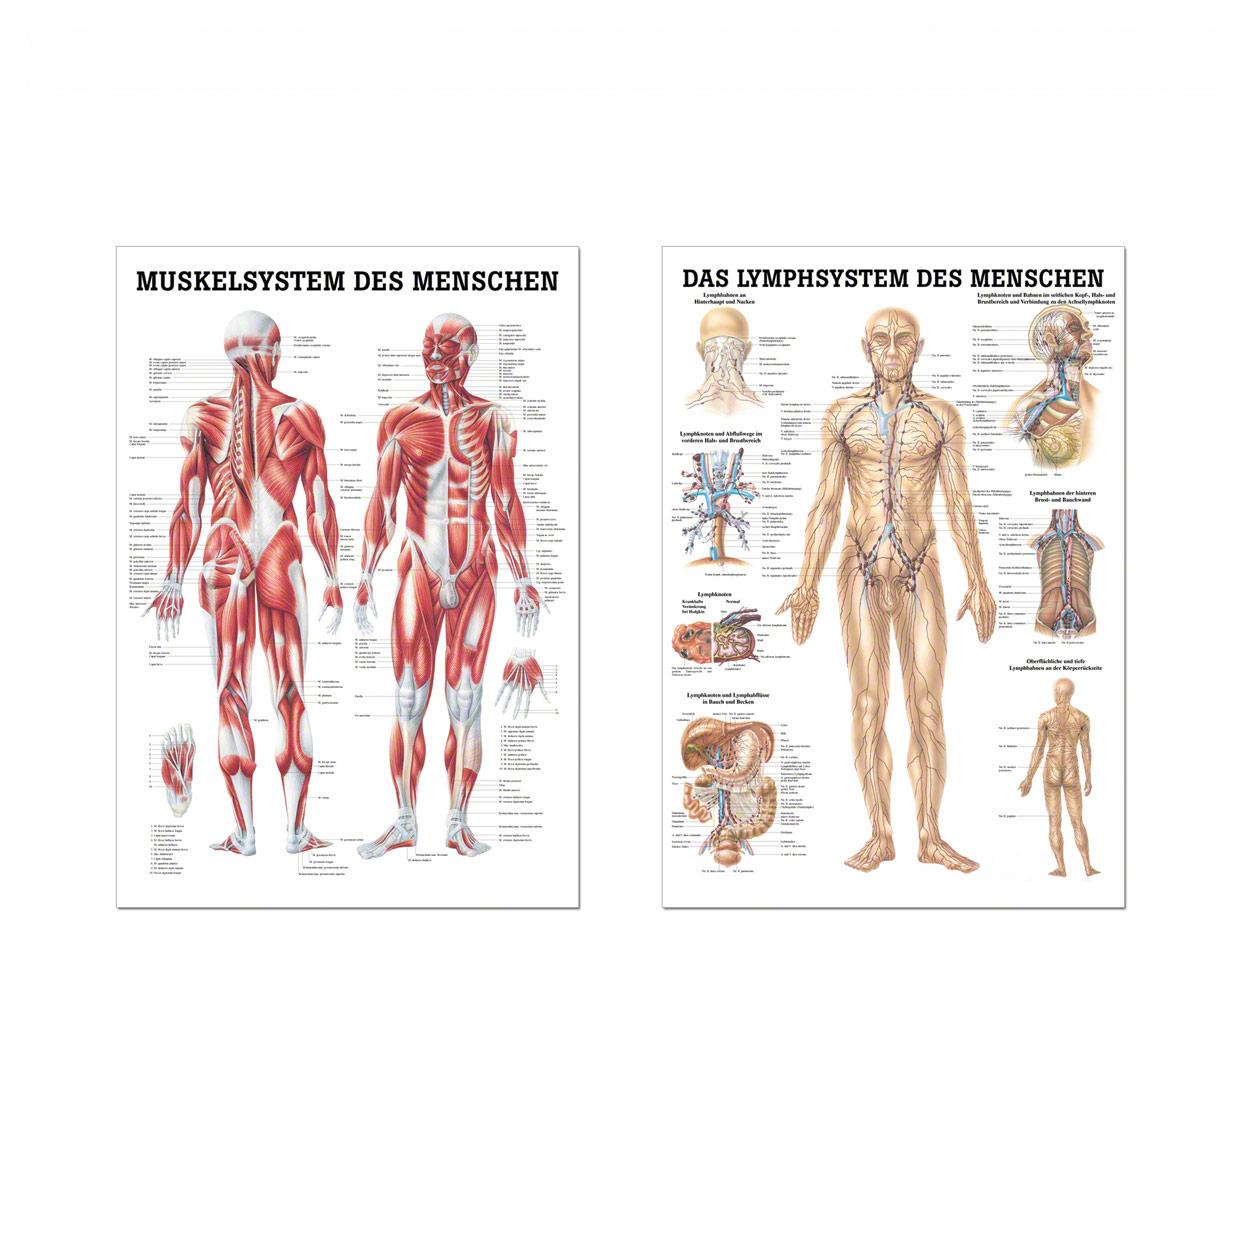 Berühmt Funktionen Des Muskelsystems Fotos - Anatomie Ideen ...